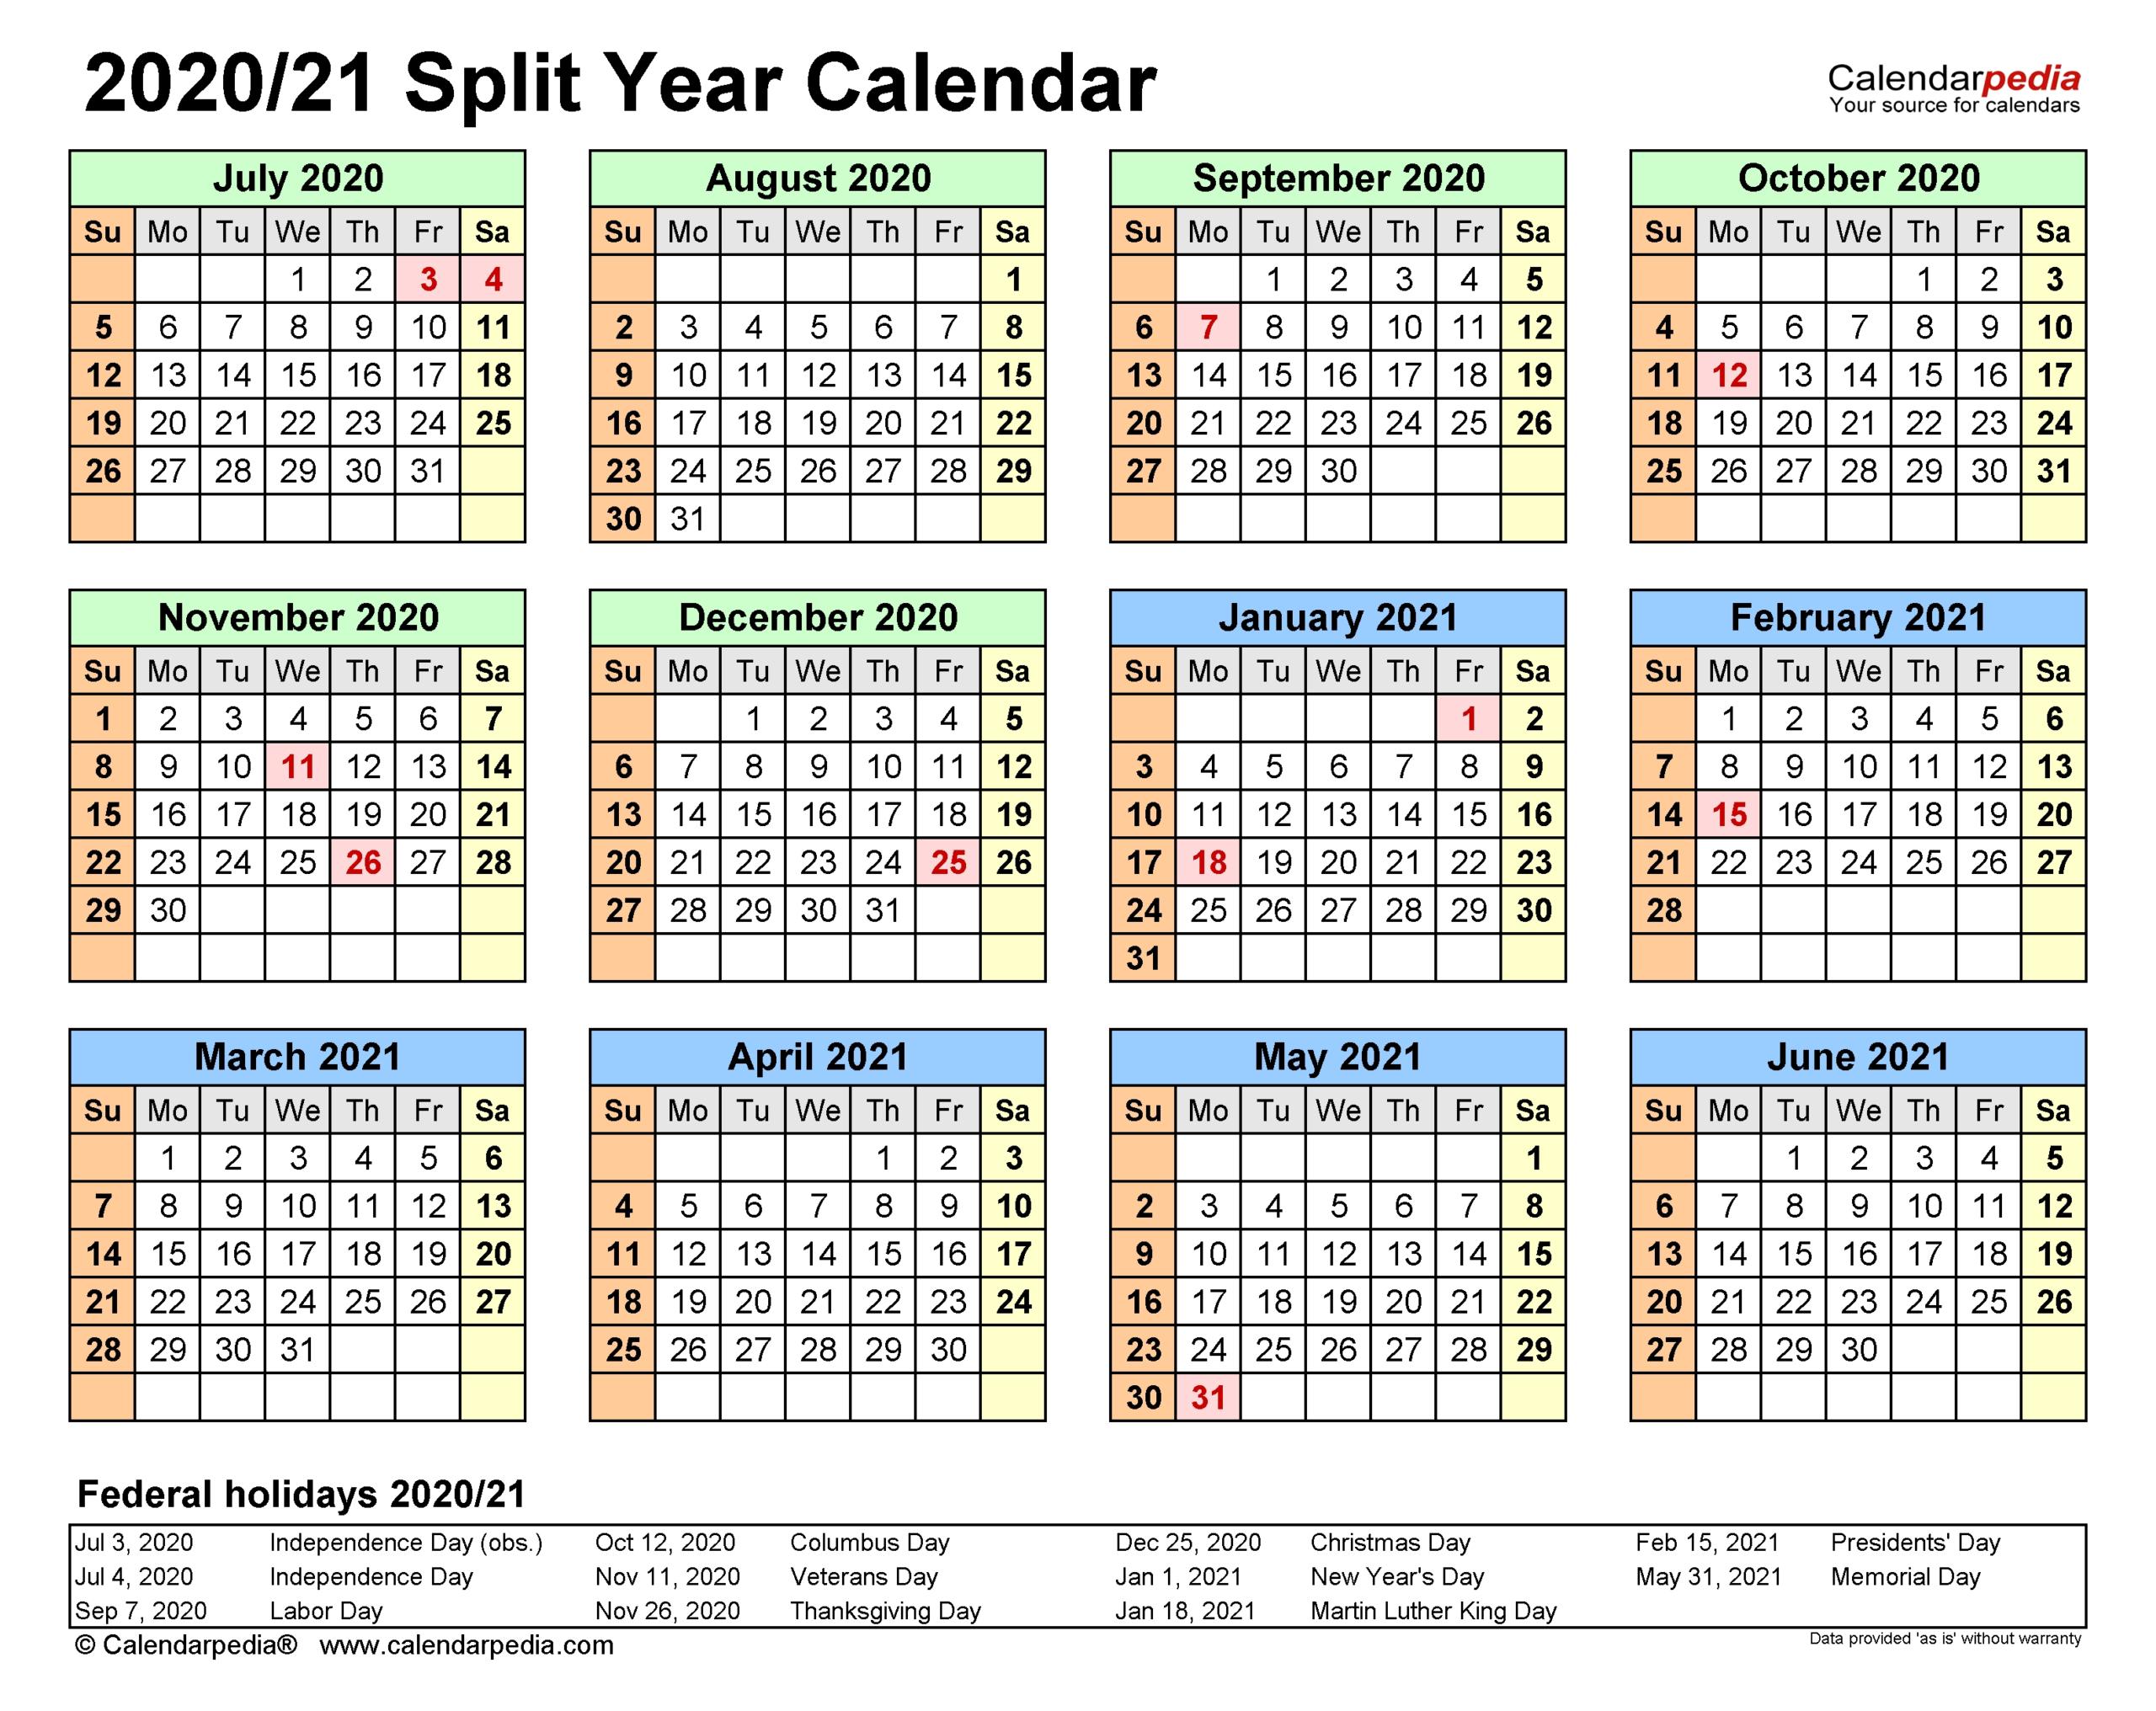 Depo Provera Calendar 2021   Calendar Printables Free Blank  Depo Provera December 4,2021 Next Due